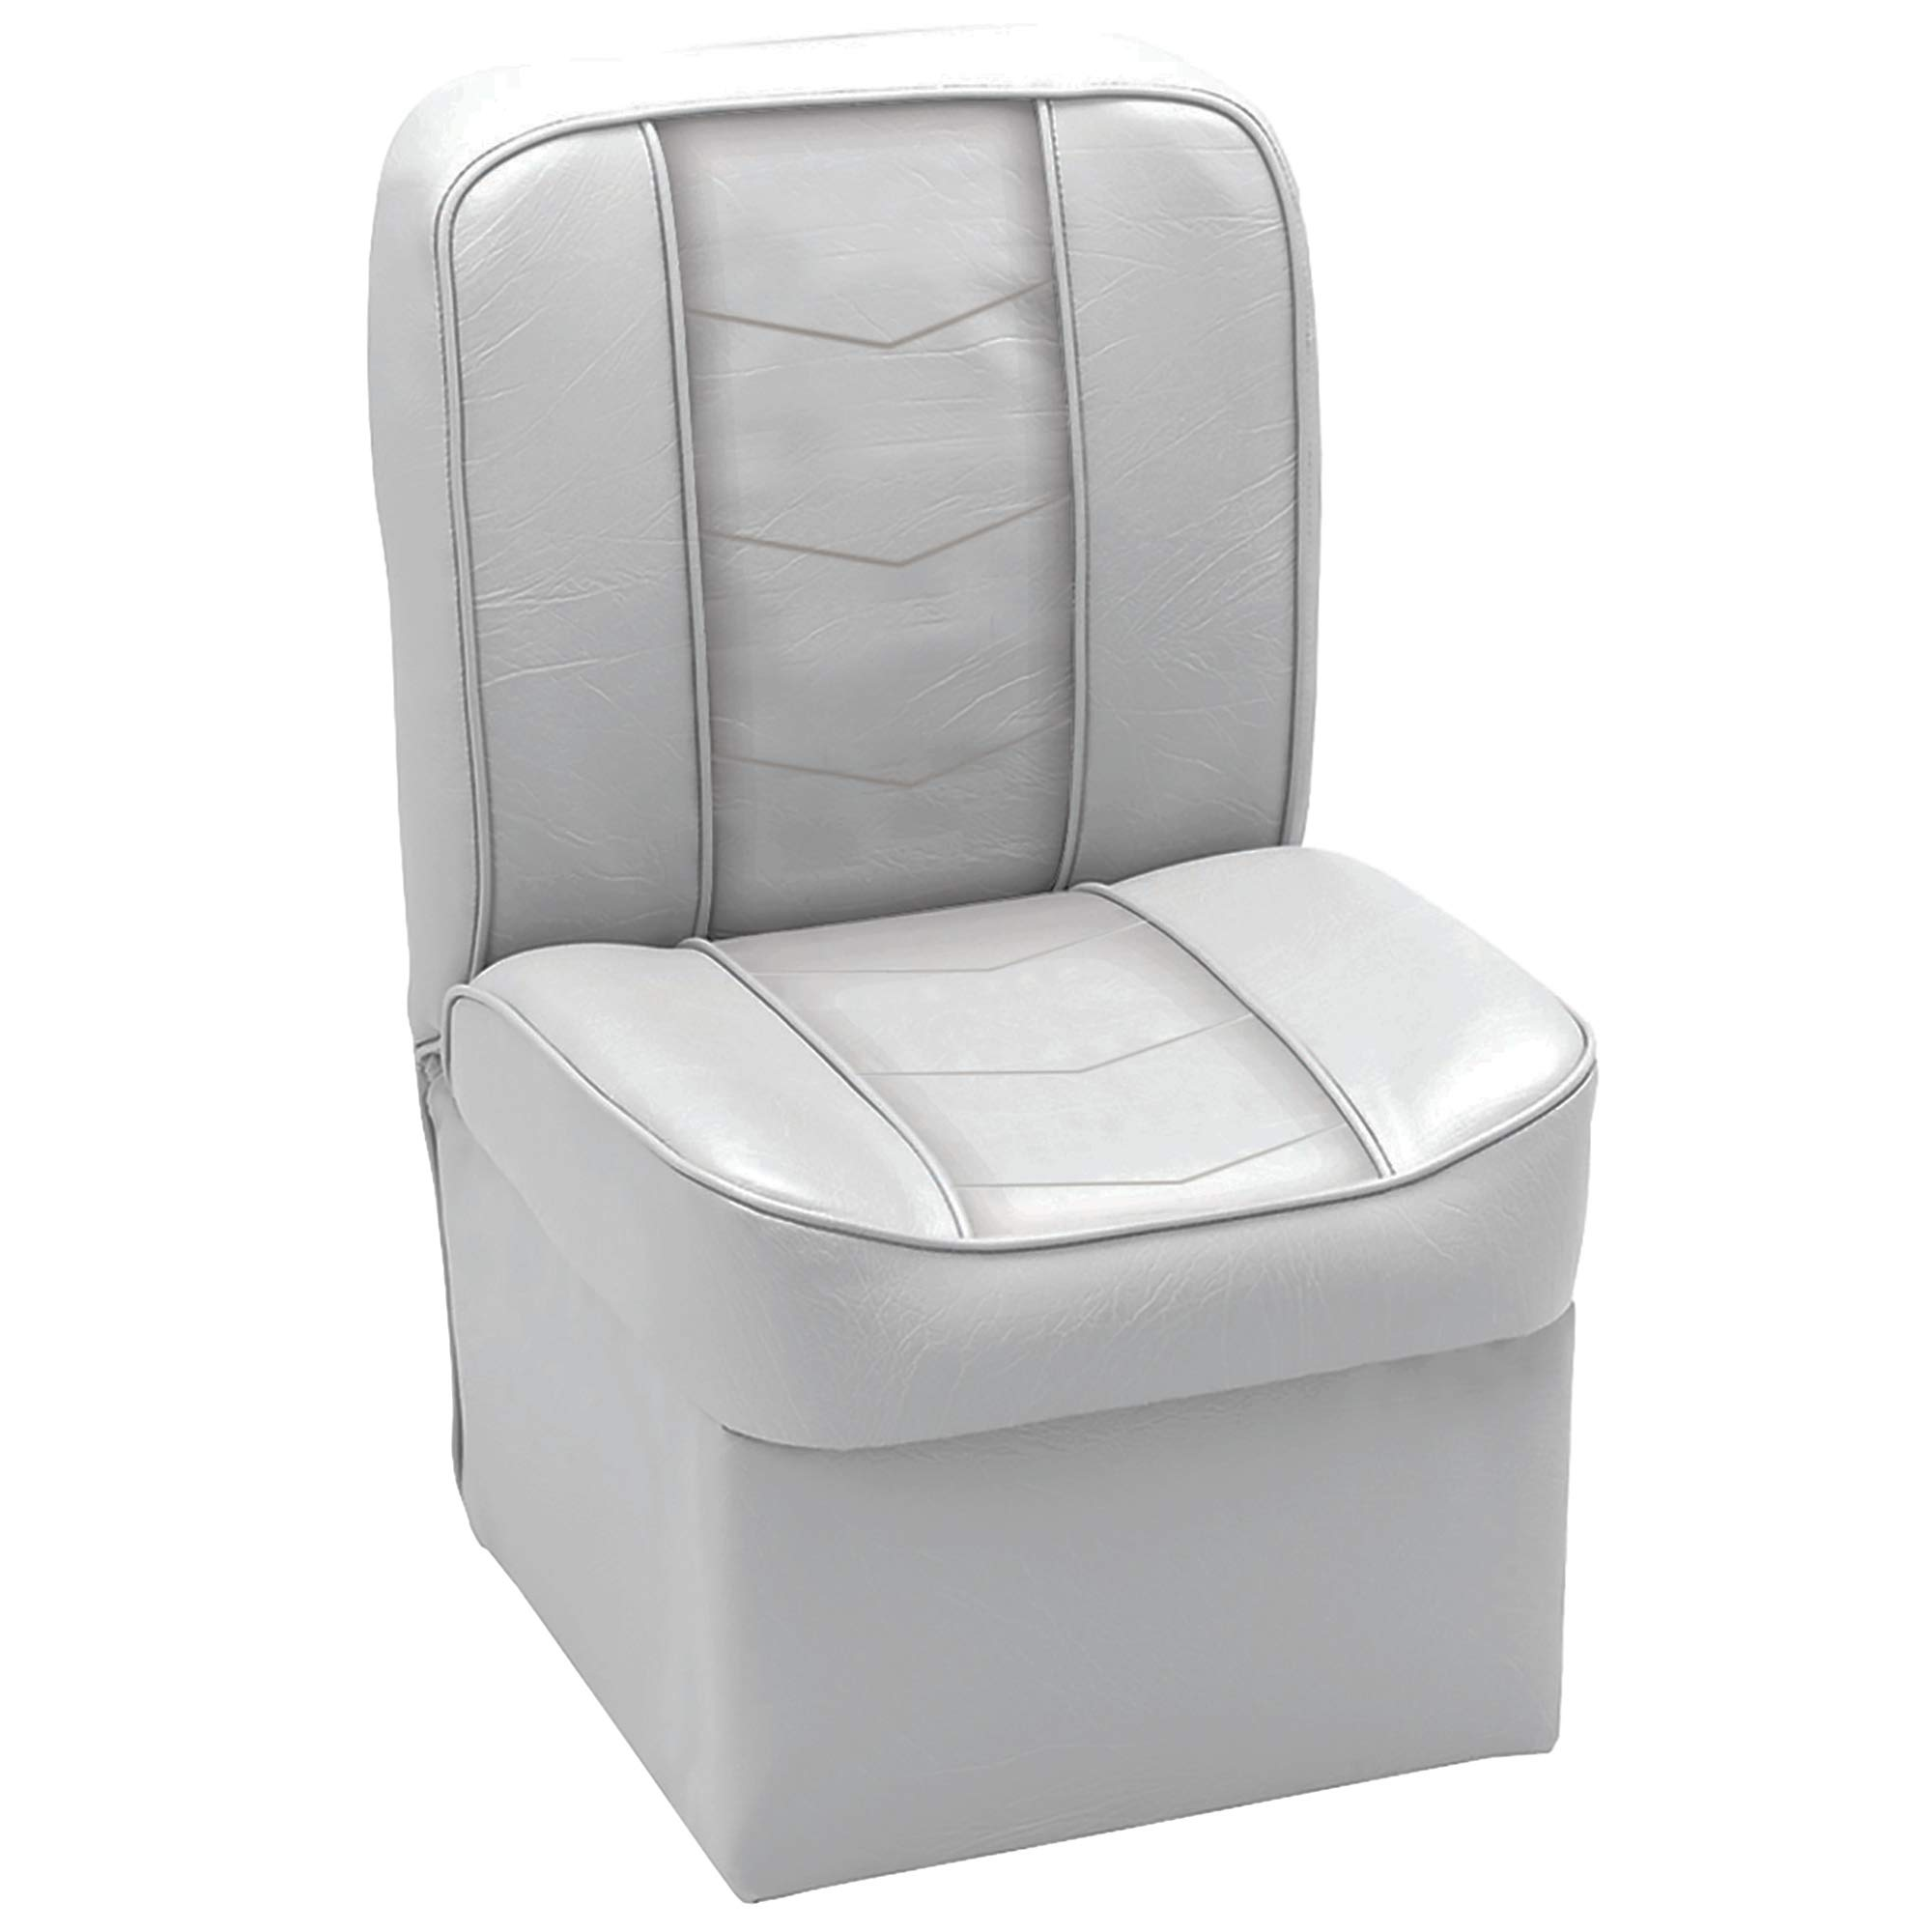 Overton's Standard Jump Seat Gray by Overton's